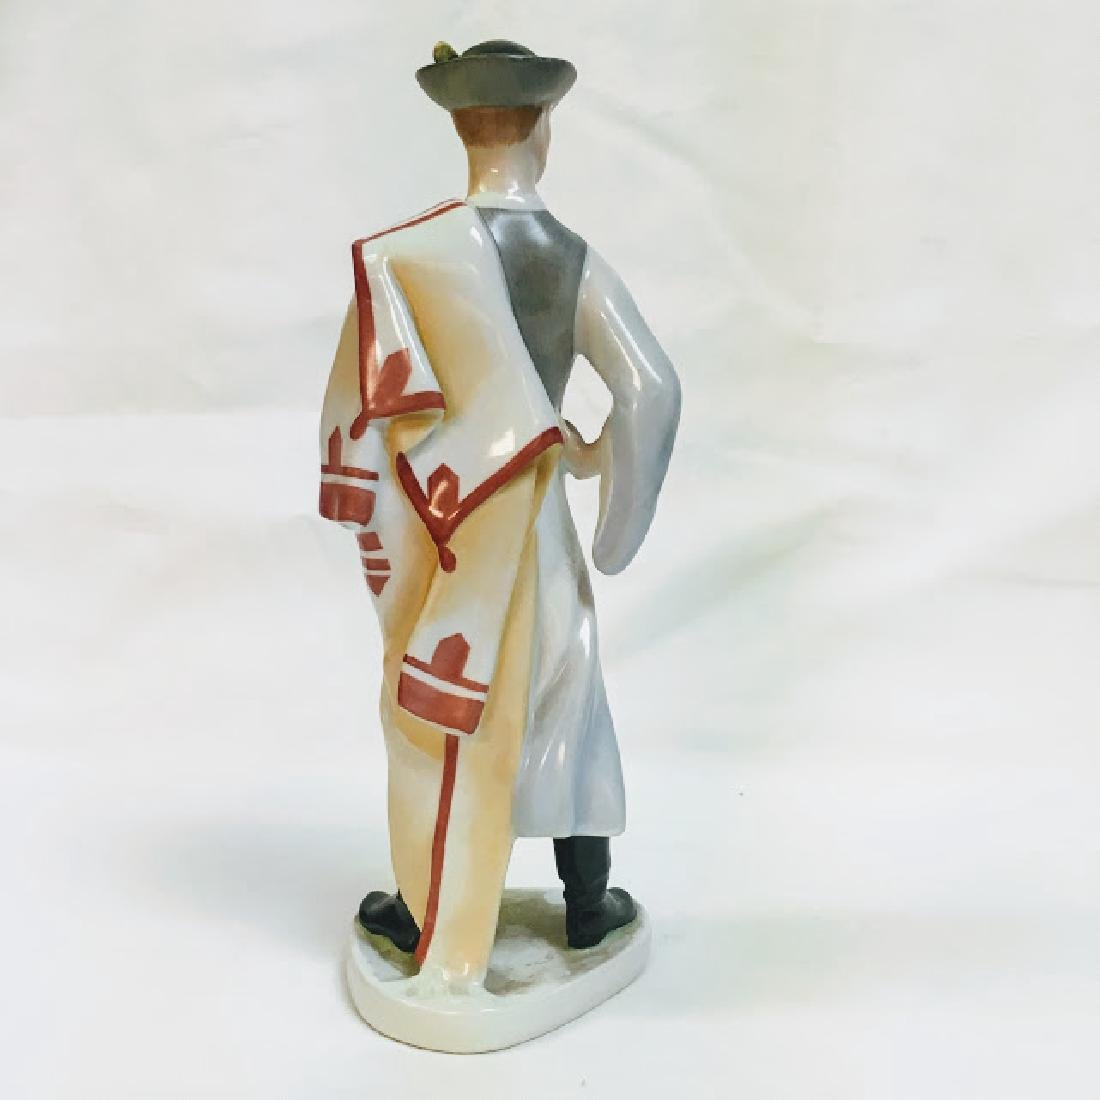 Kezifestes Budapest man in traditional costume figurine - 3